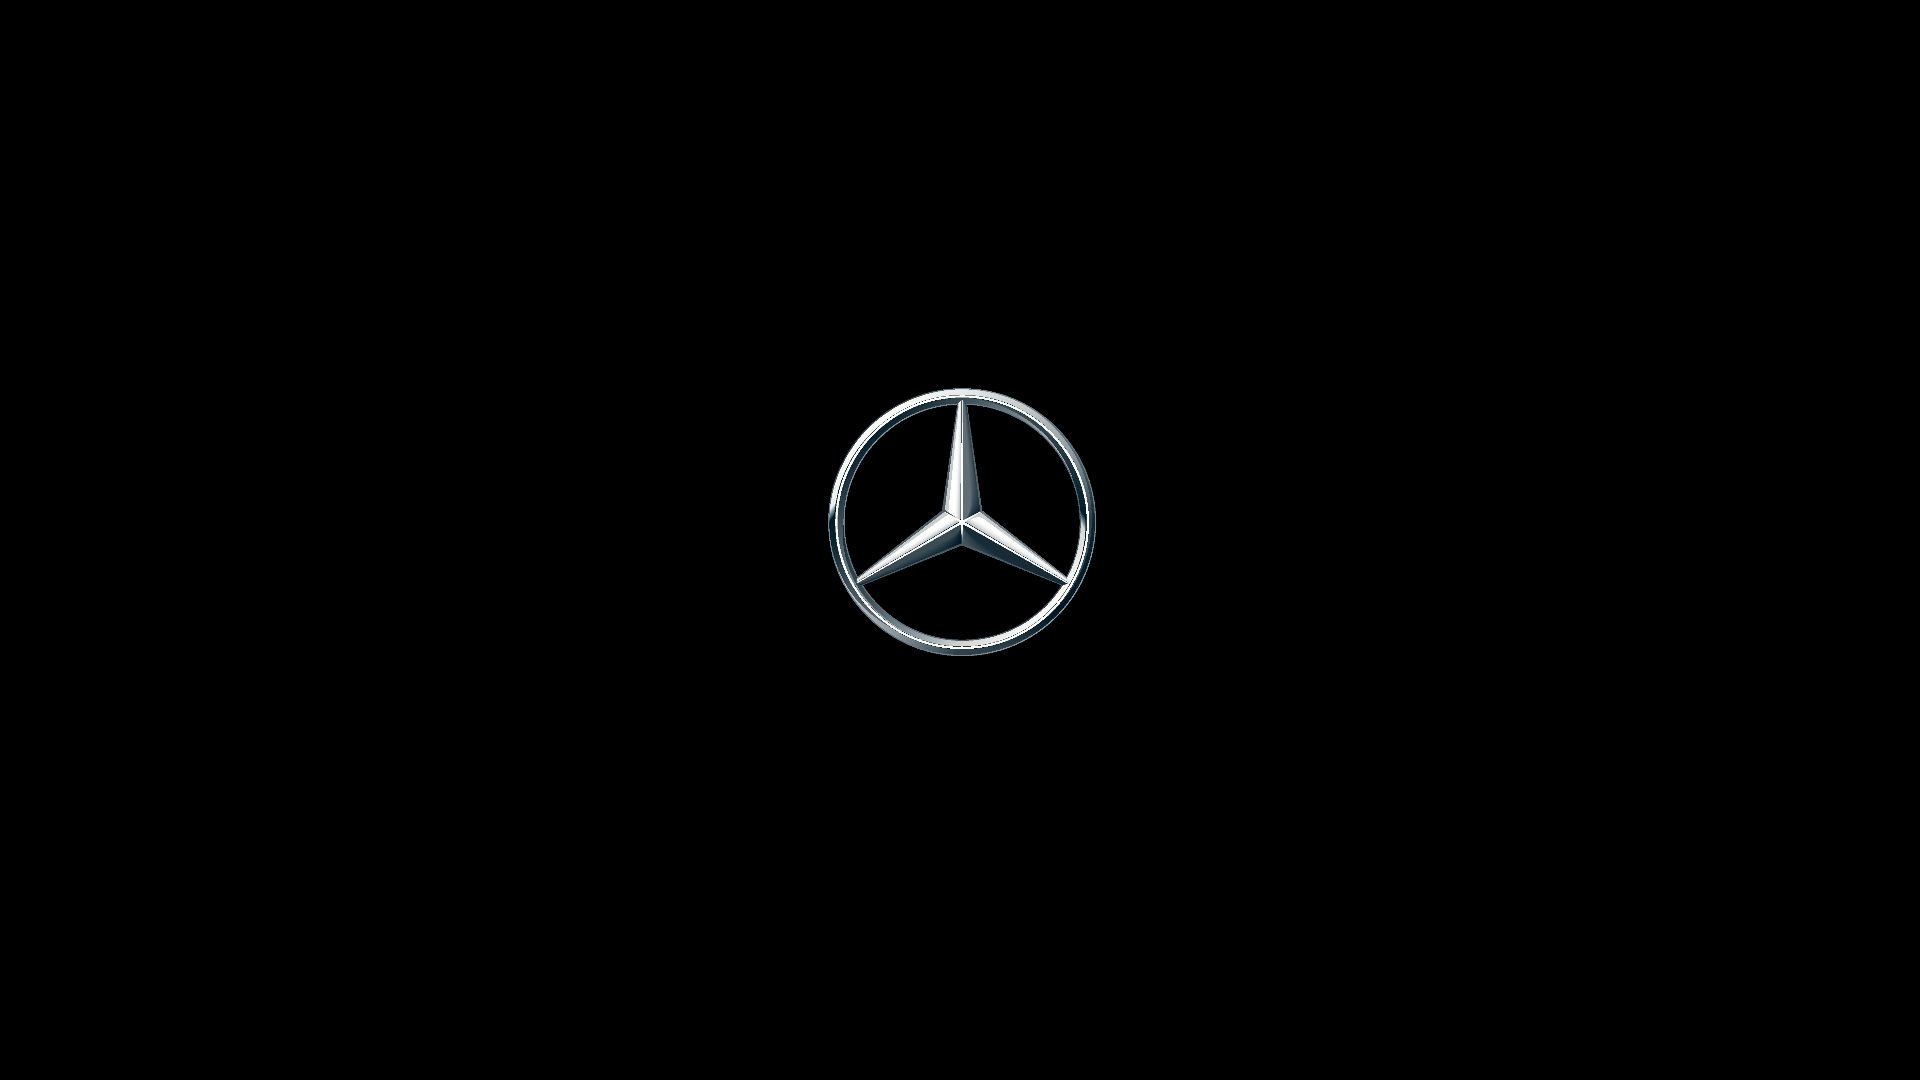 Mercedes Benz Logo Wallpaper HD | Full HD Pictures